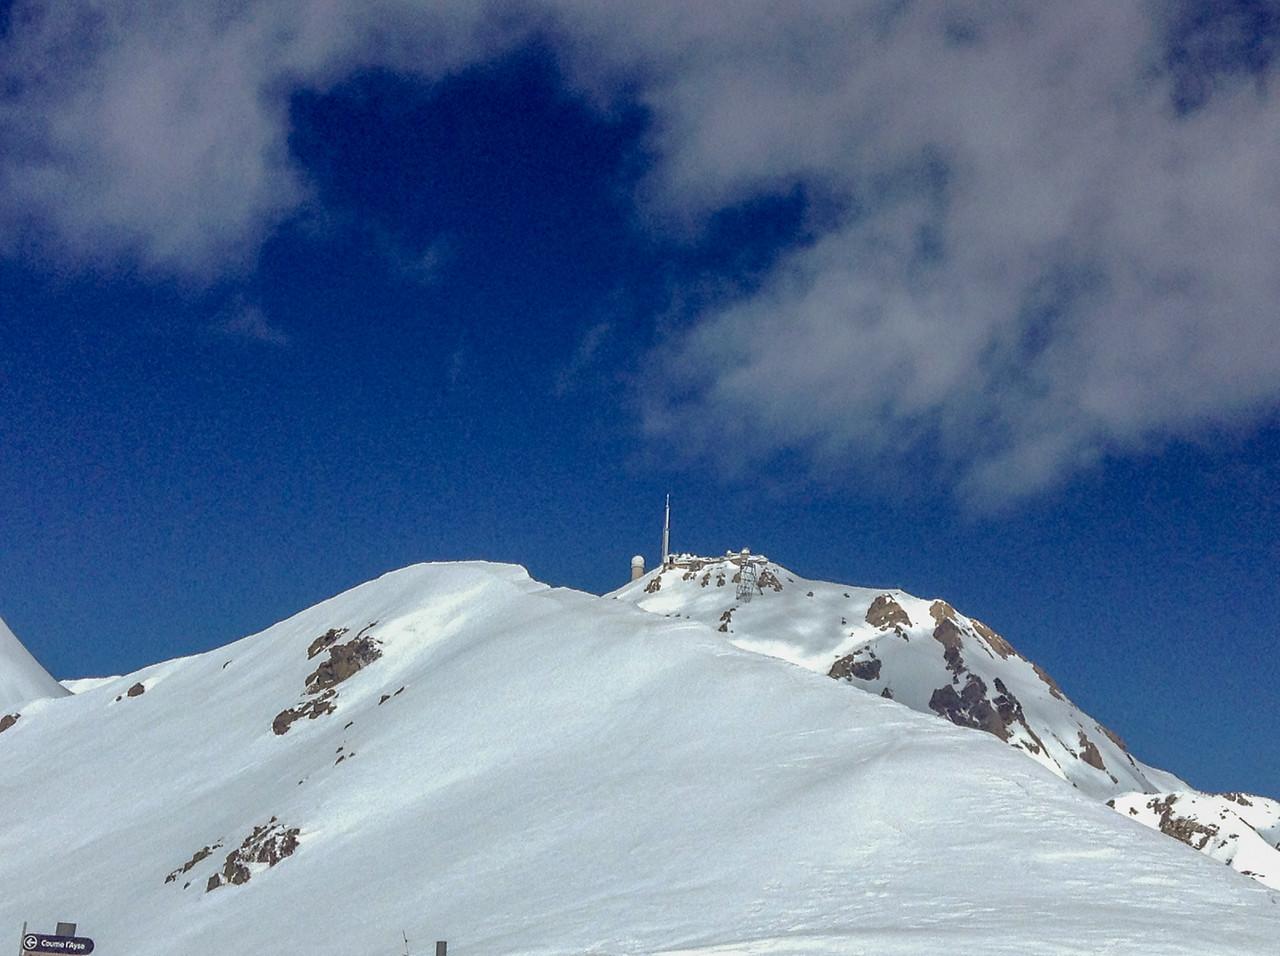 The Pic Du Midi Observatory